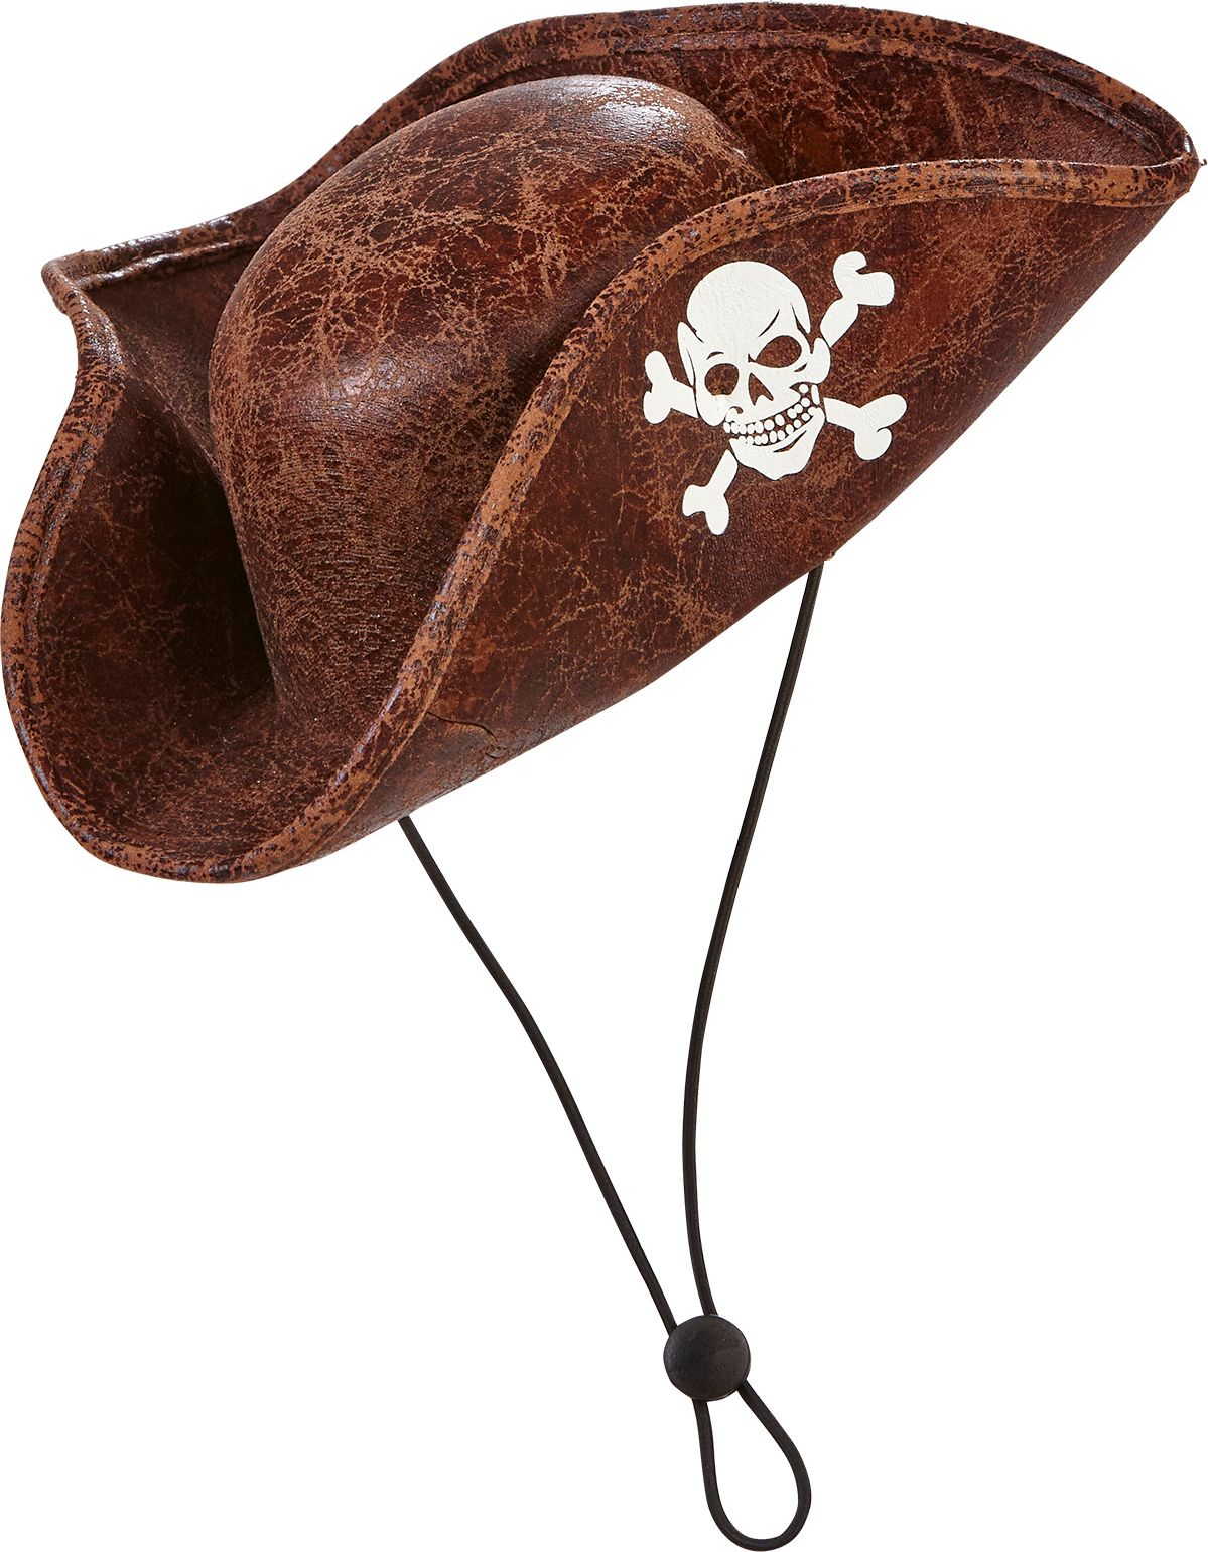 Bruine piraten tricorn